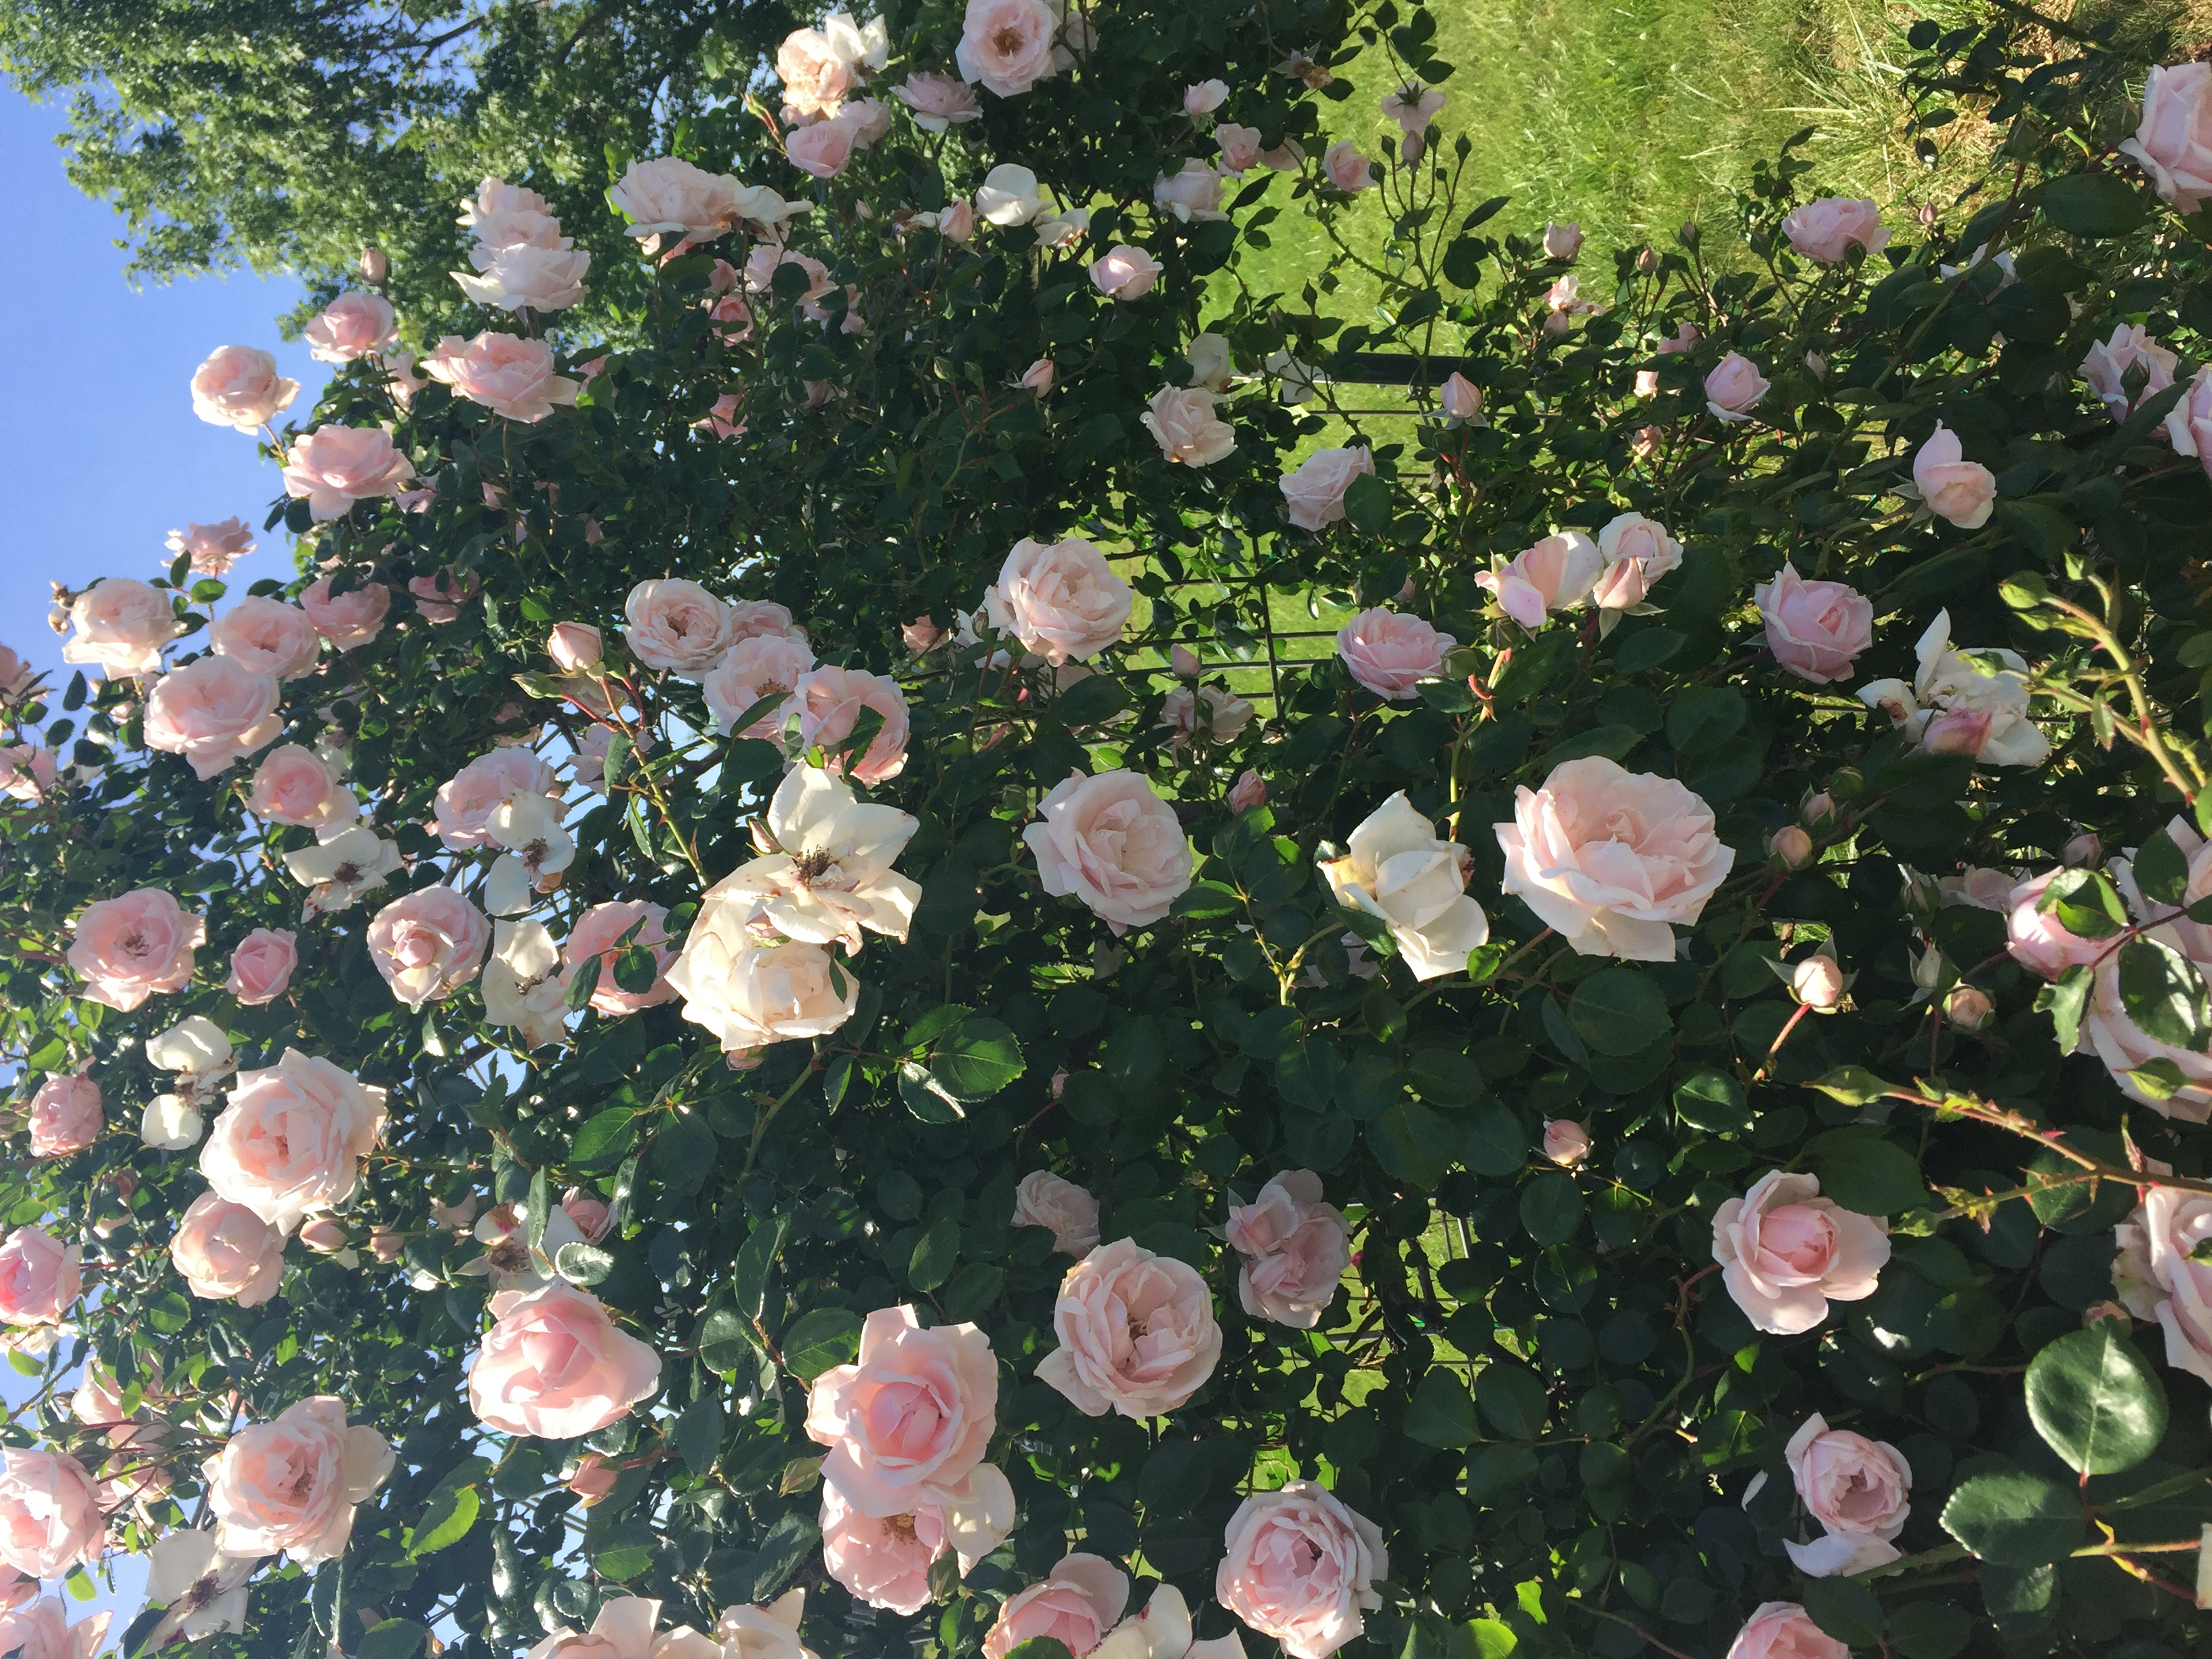 54AE3EFA F5CD 431B 8BE7 27BC8FAAA136 Roses in full bloom!